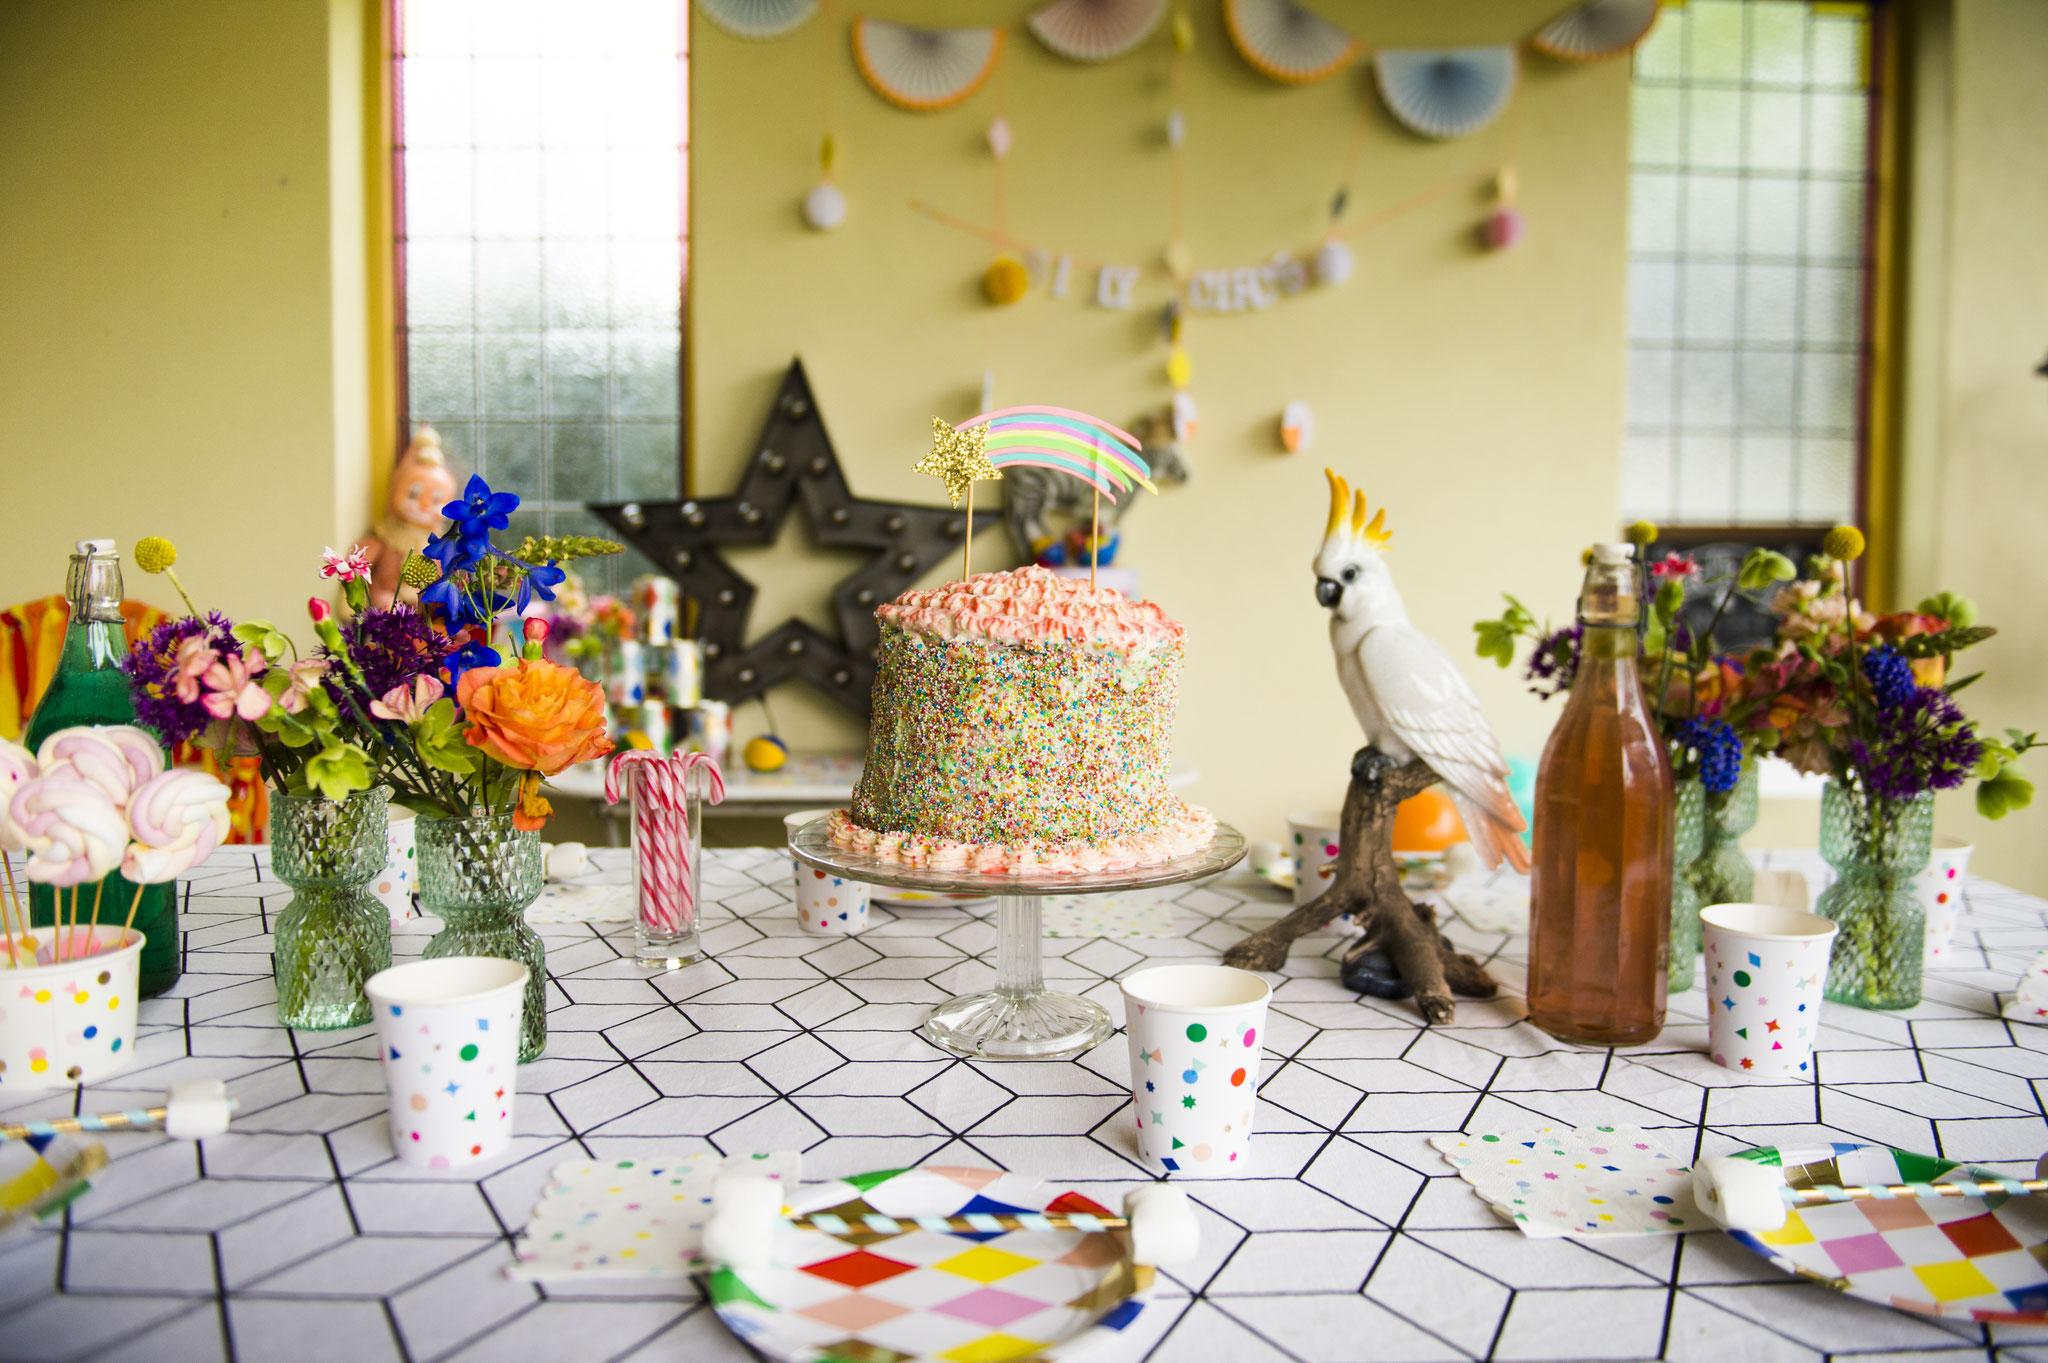 Fotocredits: Iris Kolff fotografie; Styling: Confettistories; Bloemen: Bloemennoord